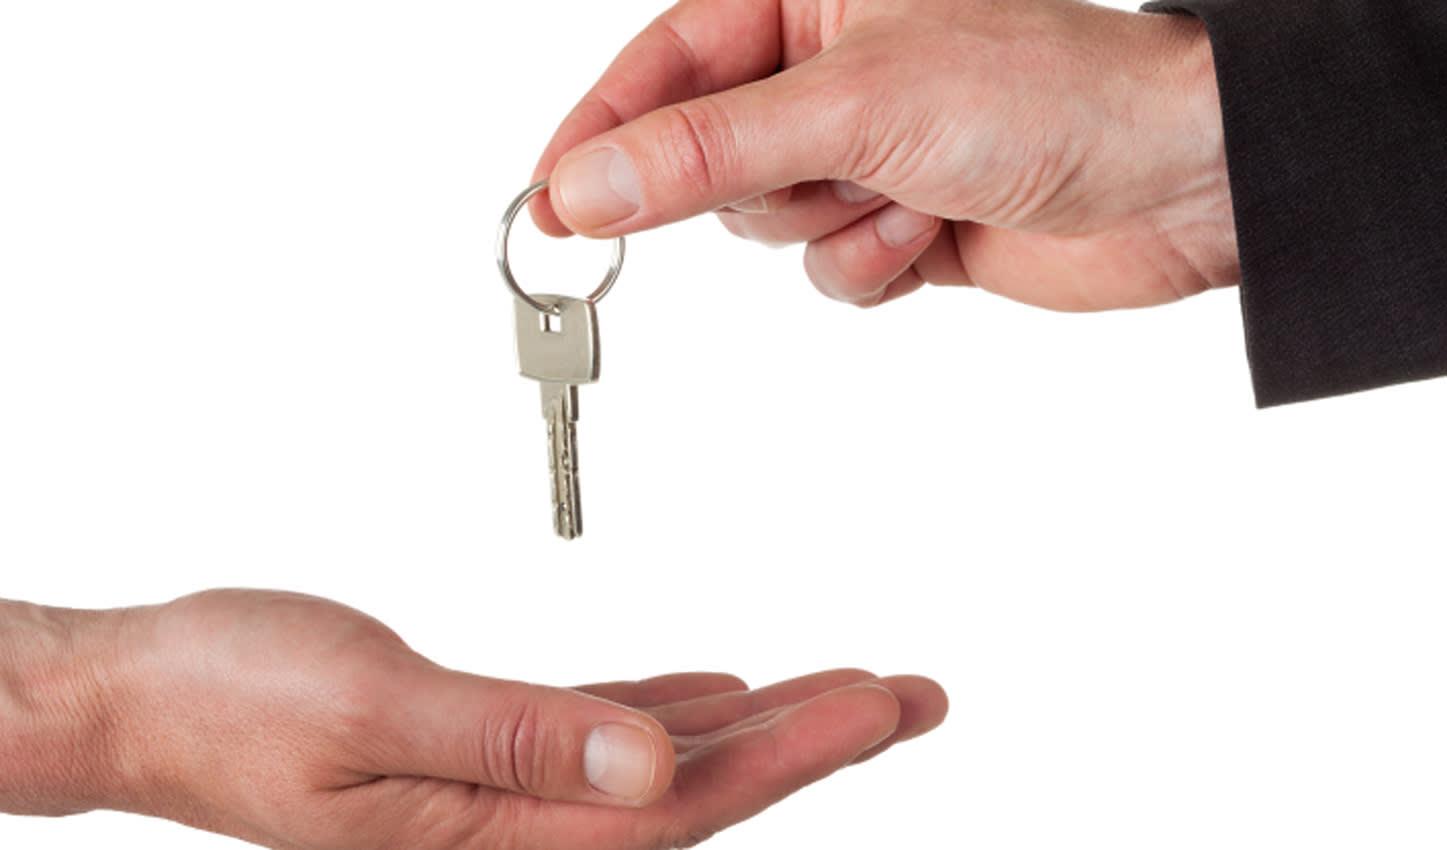 Accord BTL offers proc fee for transfers